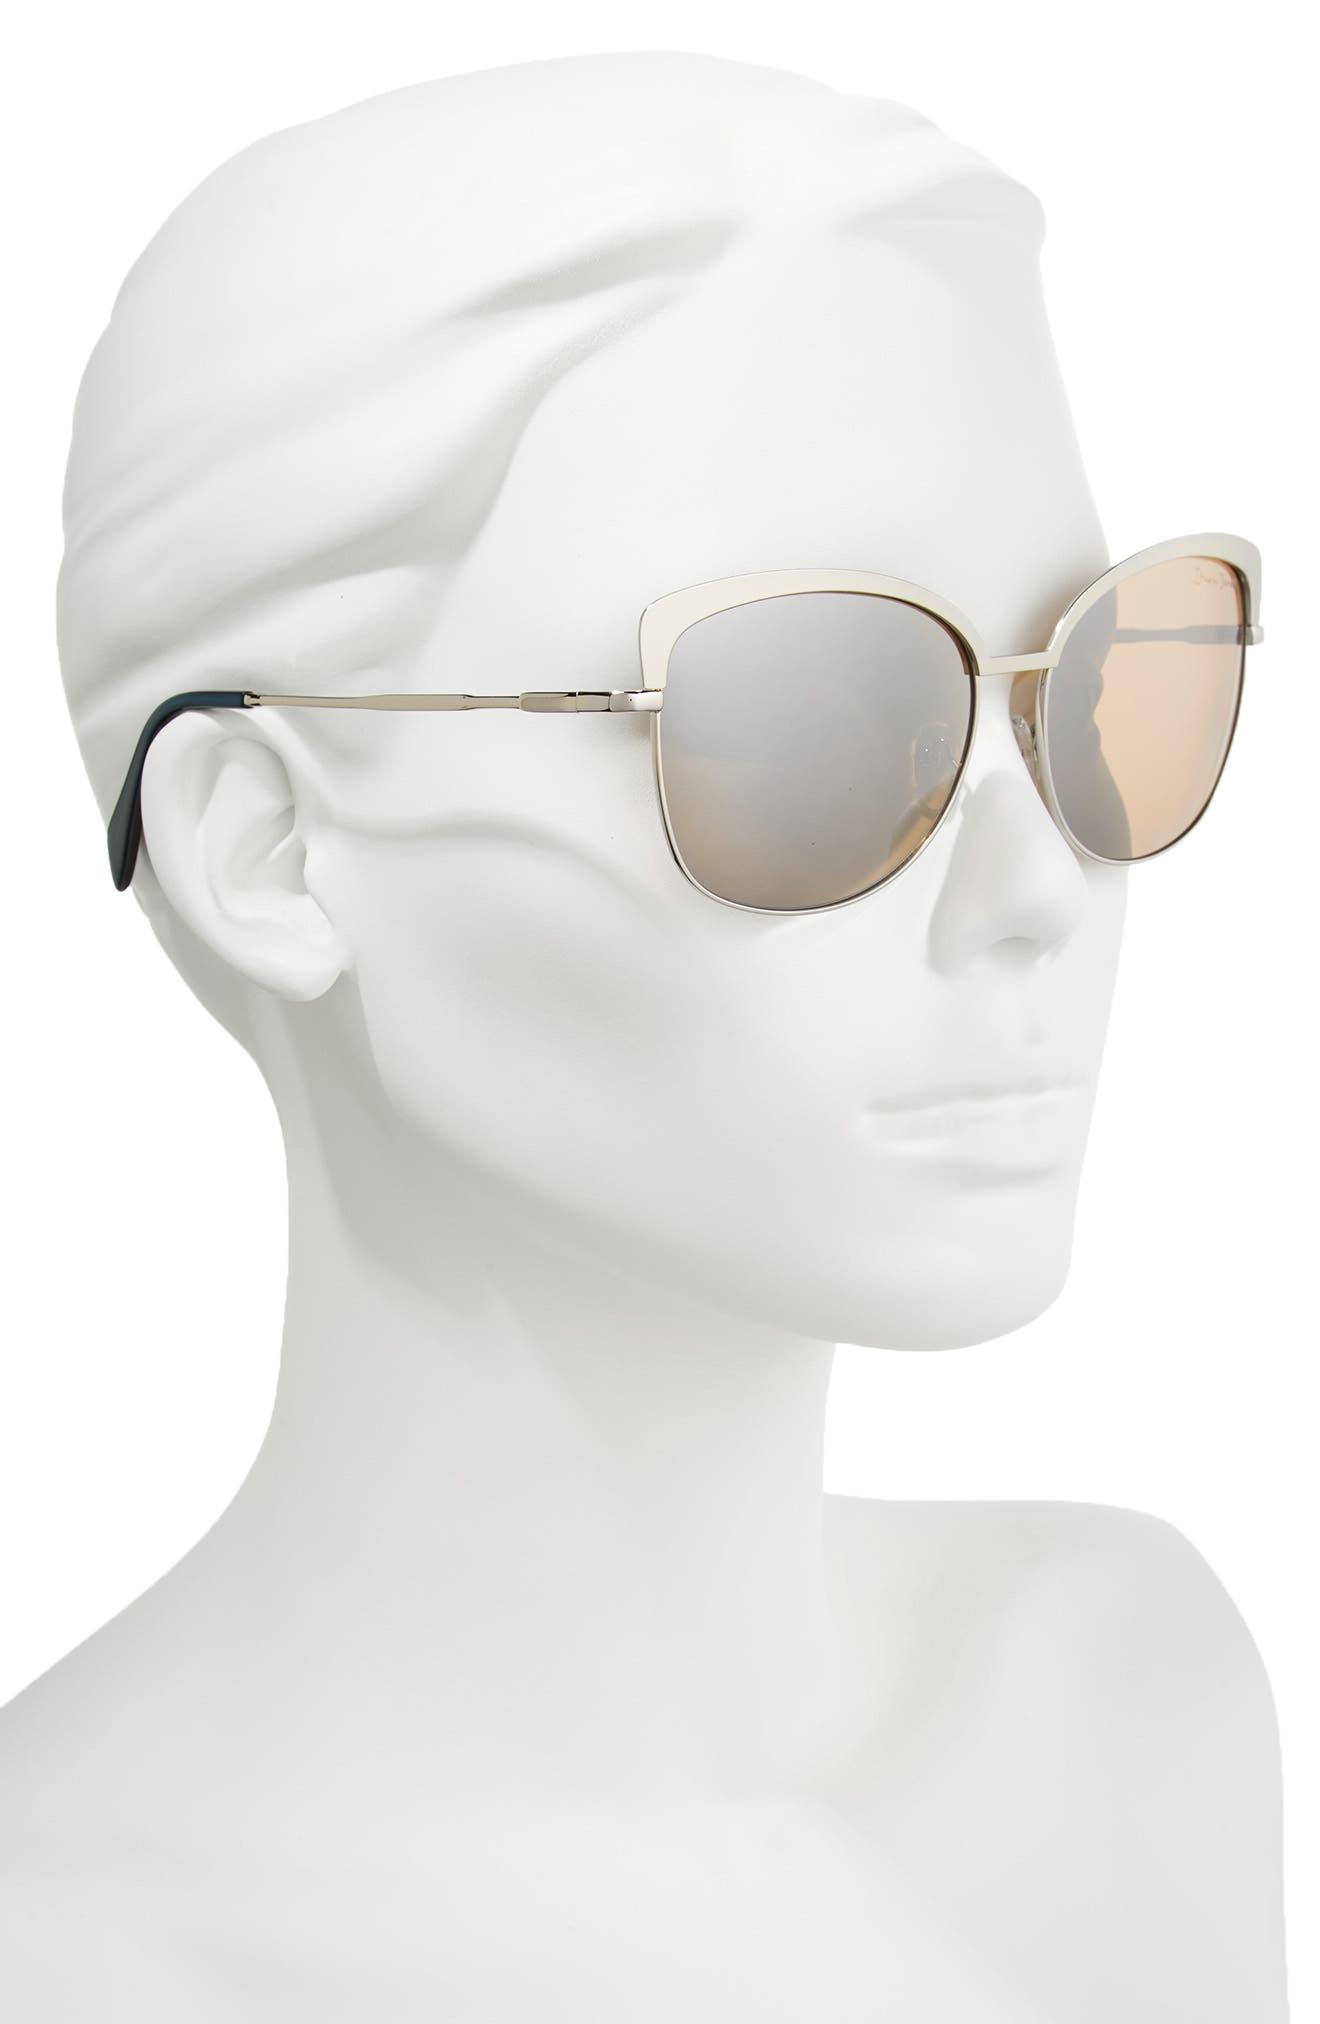 60mm Cat Eye Sunglasses,                             Alternate thumbnail 2, color,                             SHINY GUNMETAL